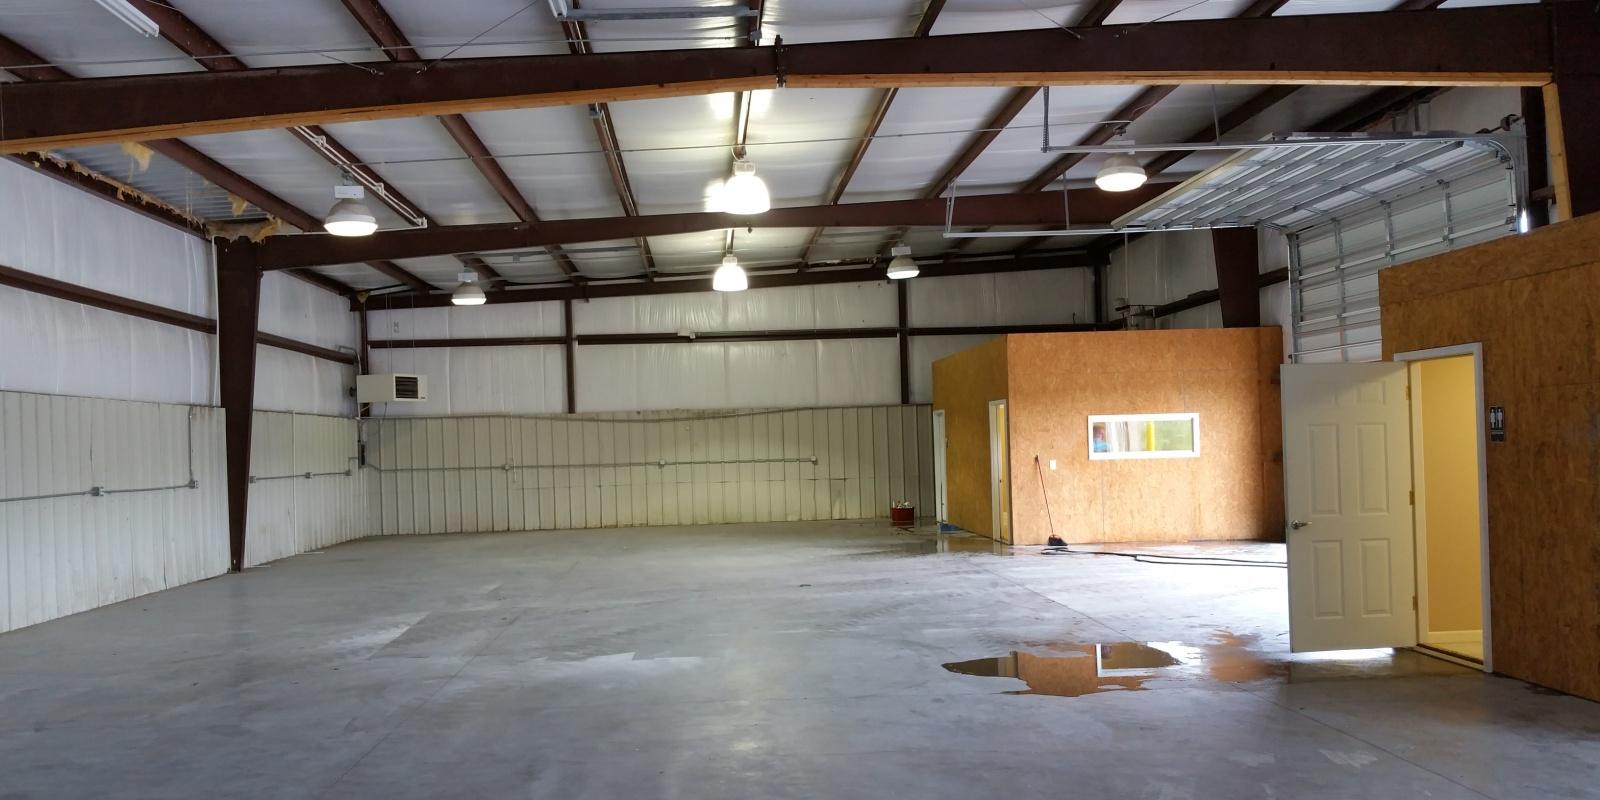 Lot 2 Thompson Road,Longs,South Carolina,29568,Industrial / Flex,Thompson Road,1332